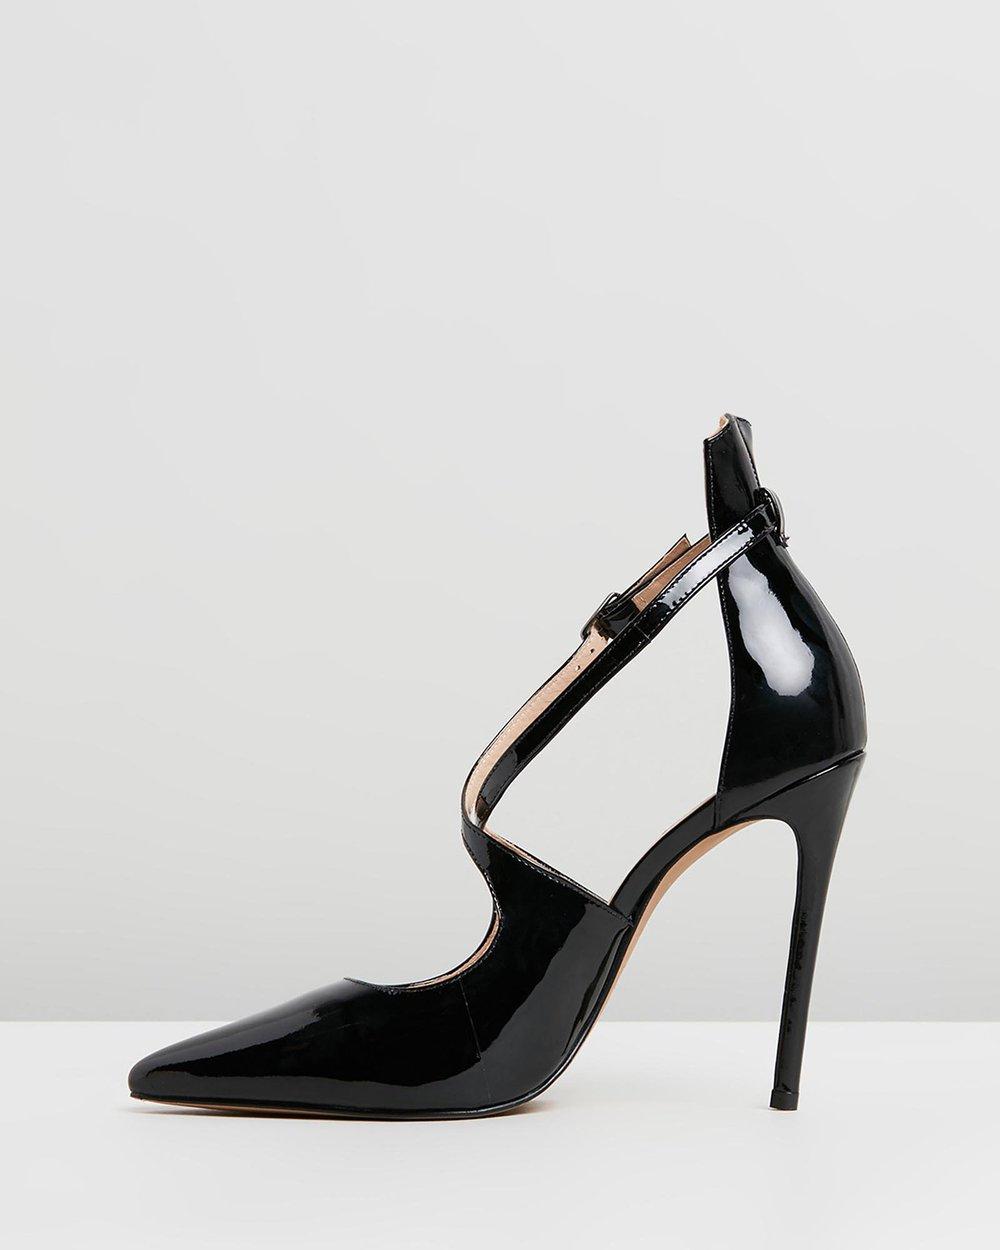 db16d679e Callie - Black Patent - Nina ArmandoNina Armando